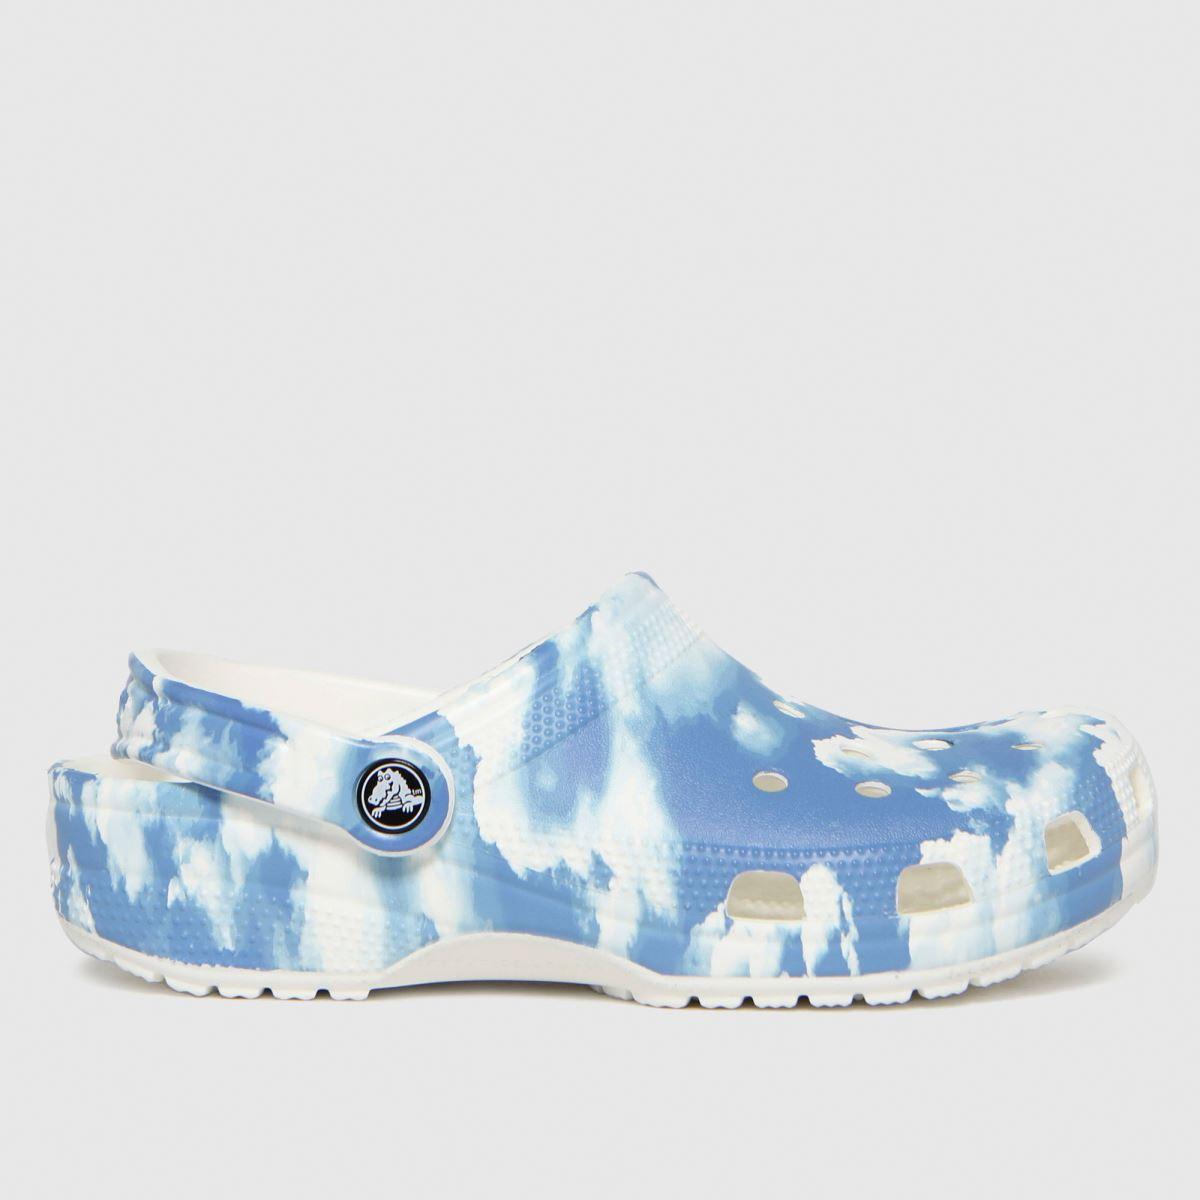 Crocs White & Blue Classic Clog Sandals